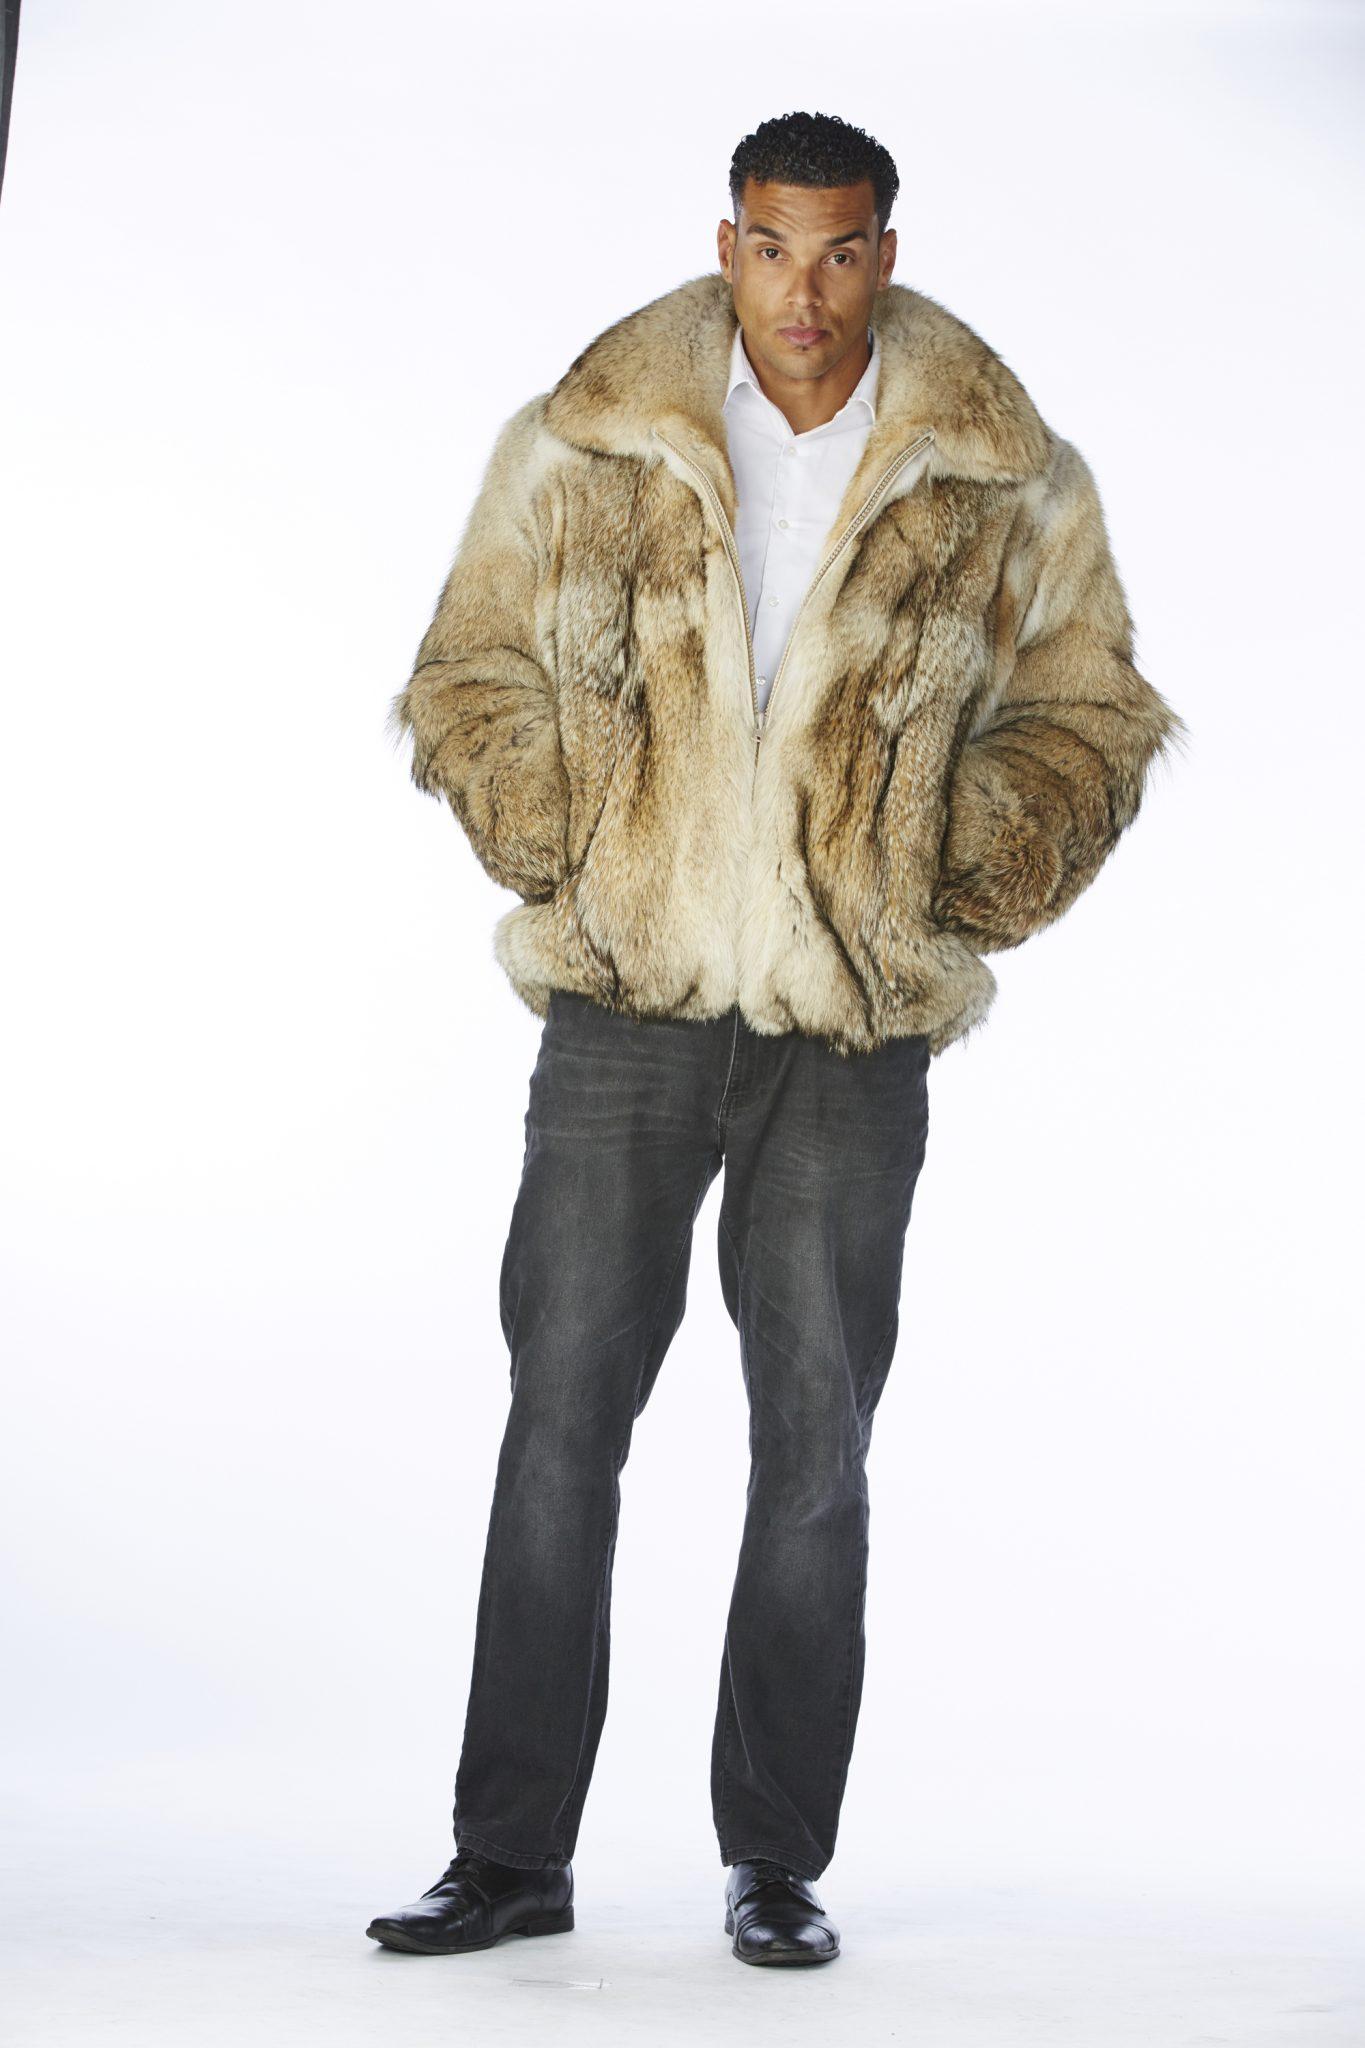 Coyote Fur Coat Womens Large Estate Furs >> 32 Usa Coyote Zip Up